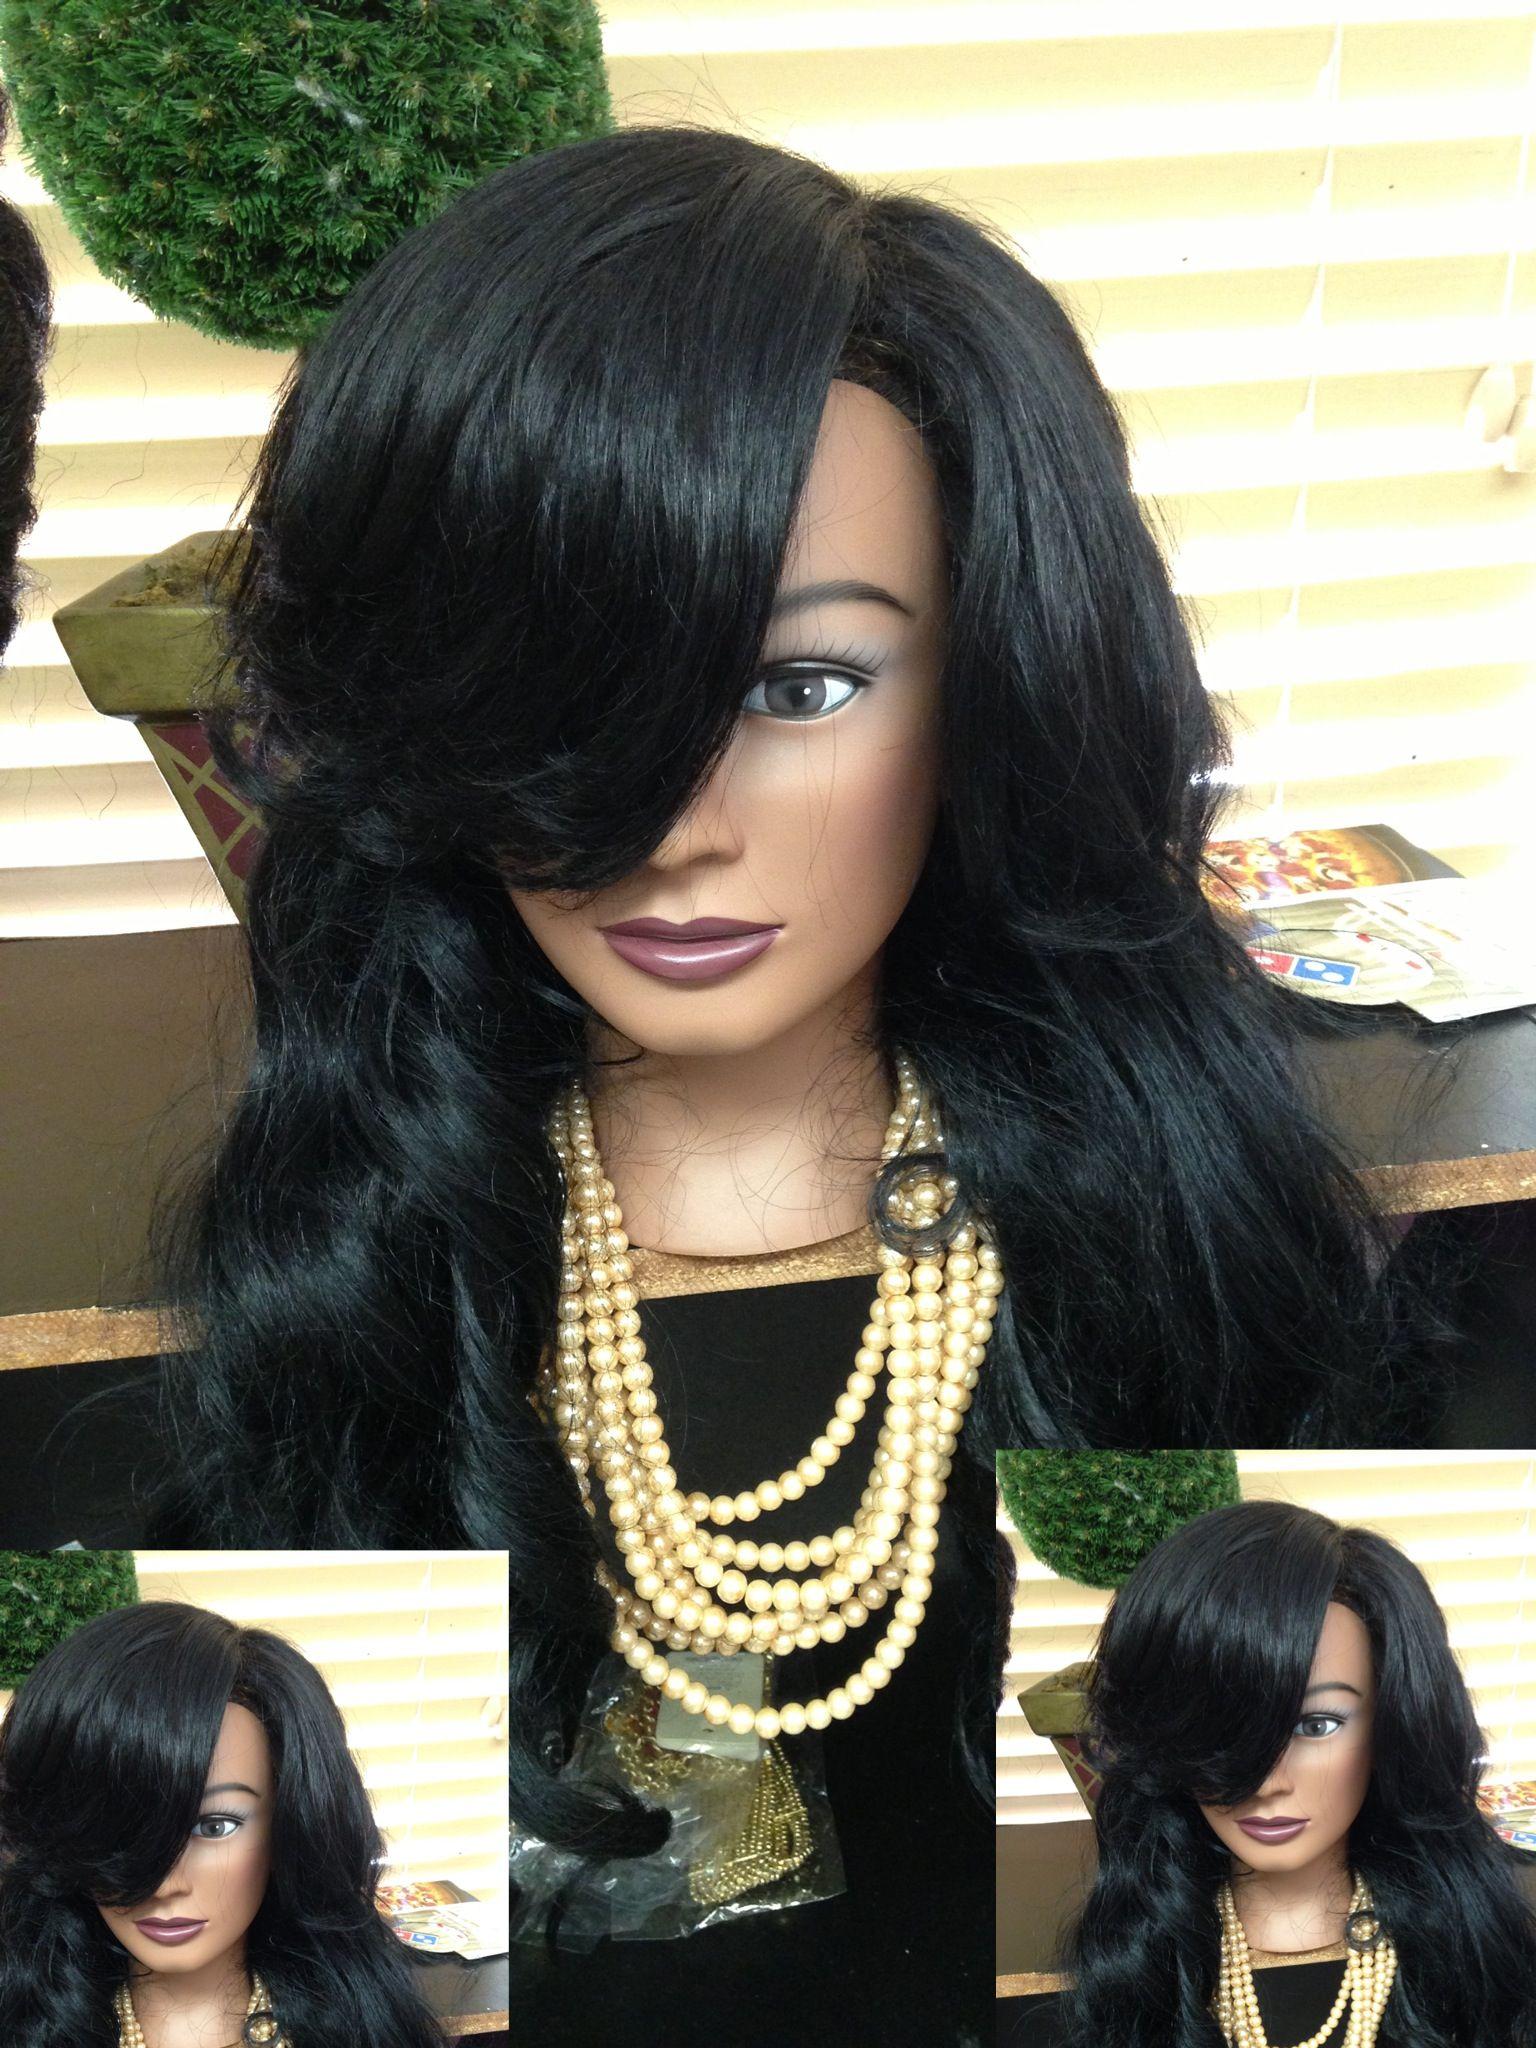 Custom Wig By Mrs Yvonne Tallahassee Fl Styles By Mrs Yvonne